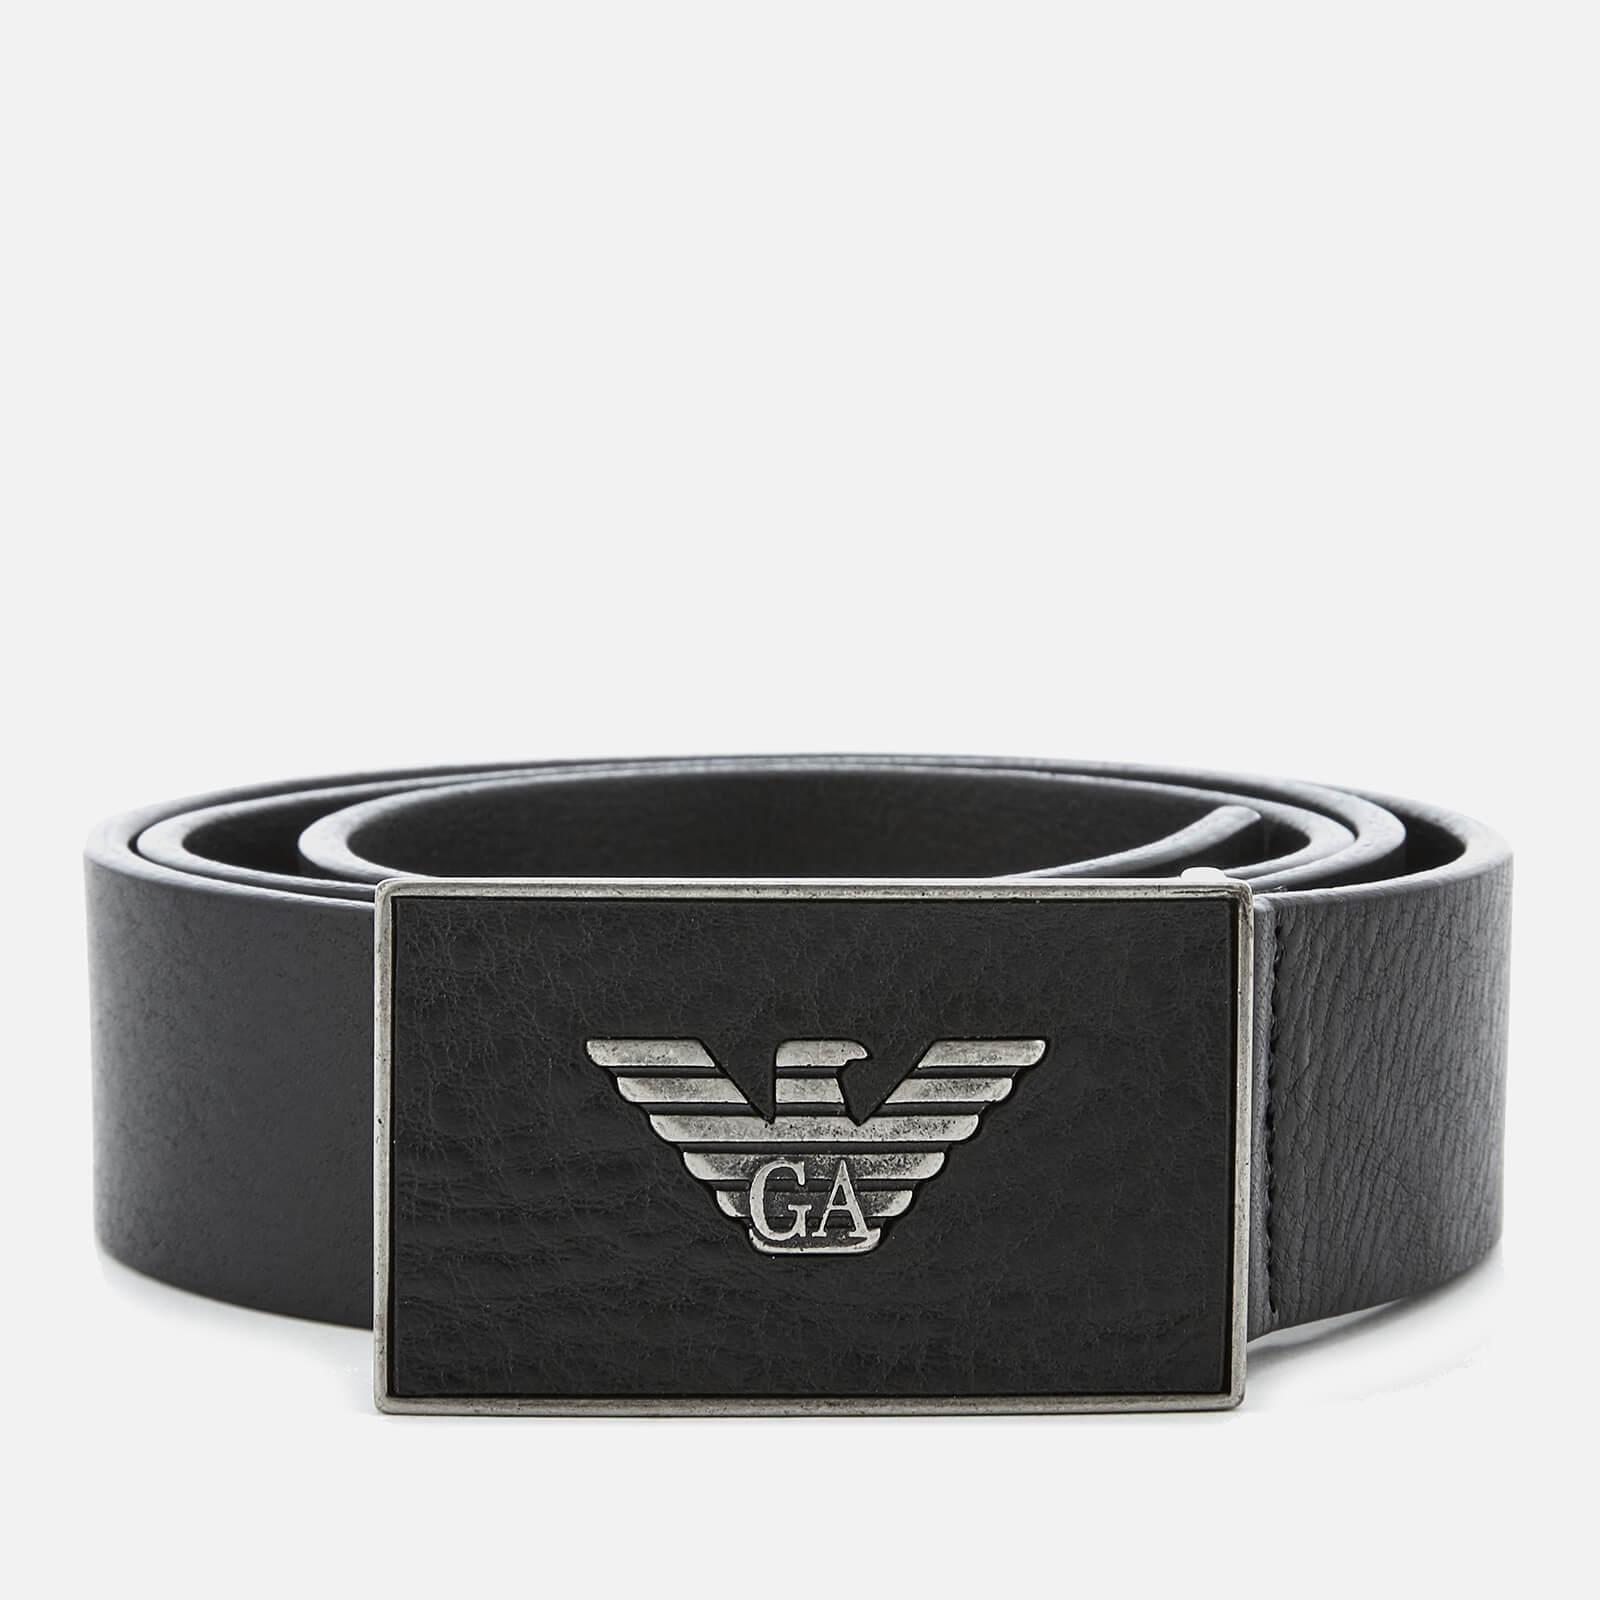 Emporio Armani Men's Plate Belt - Black - Eu 100/W39.5